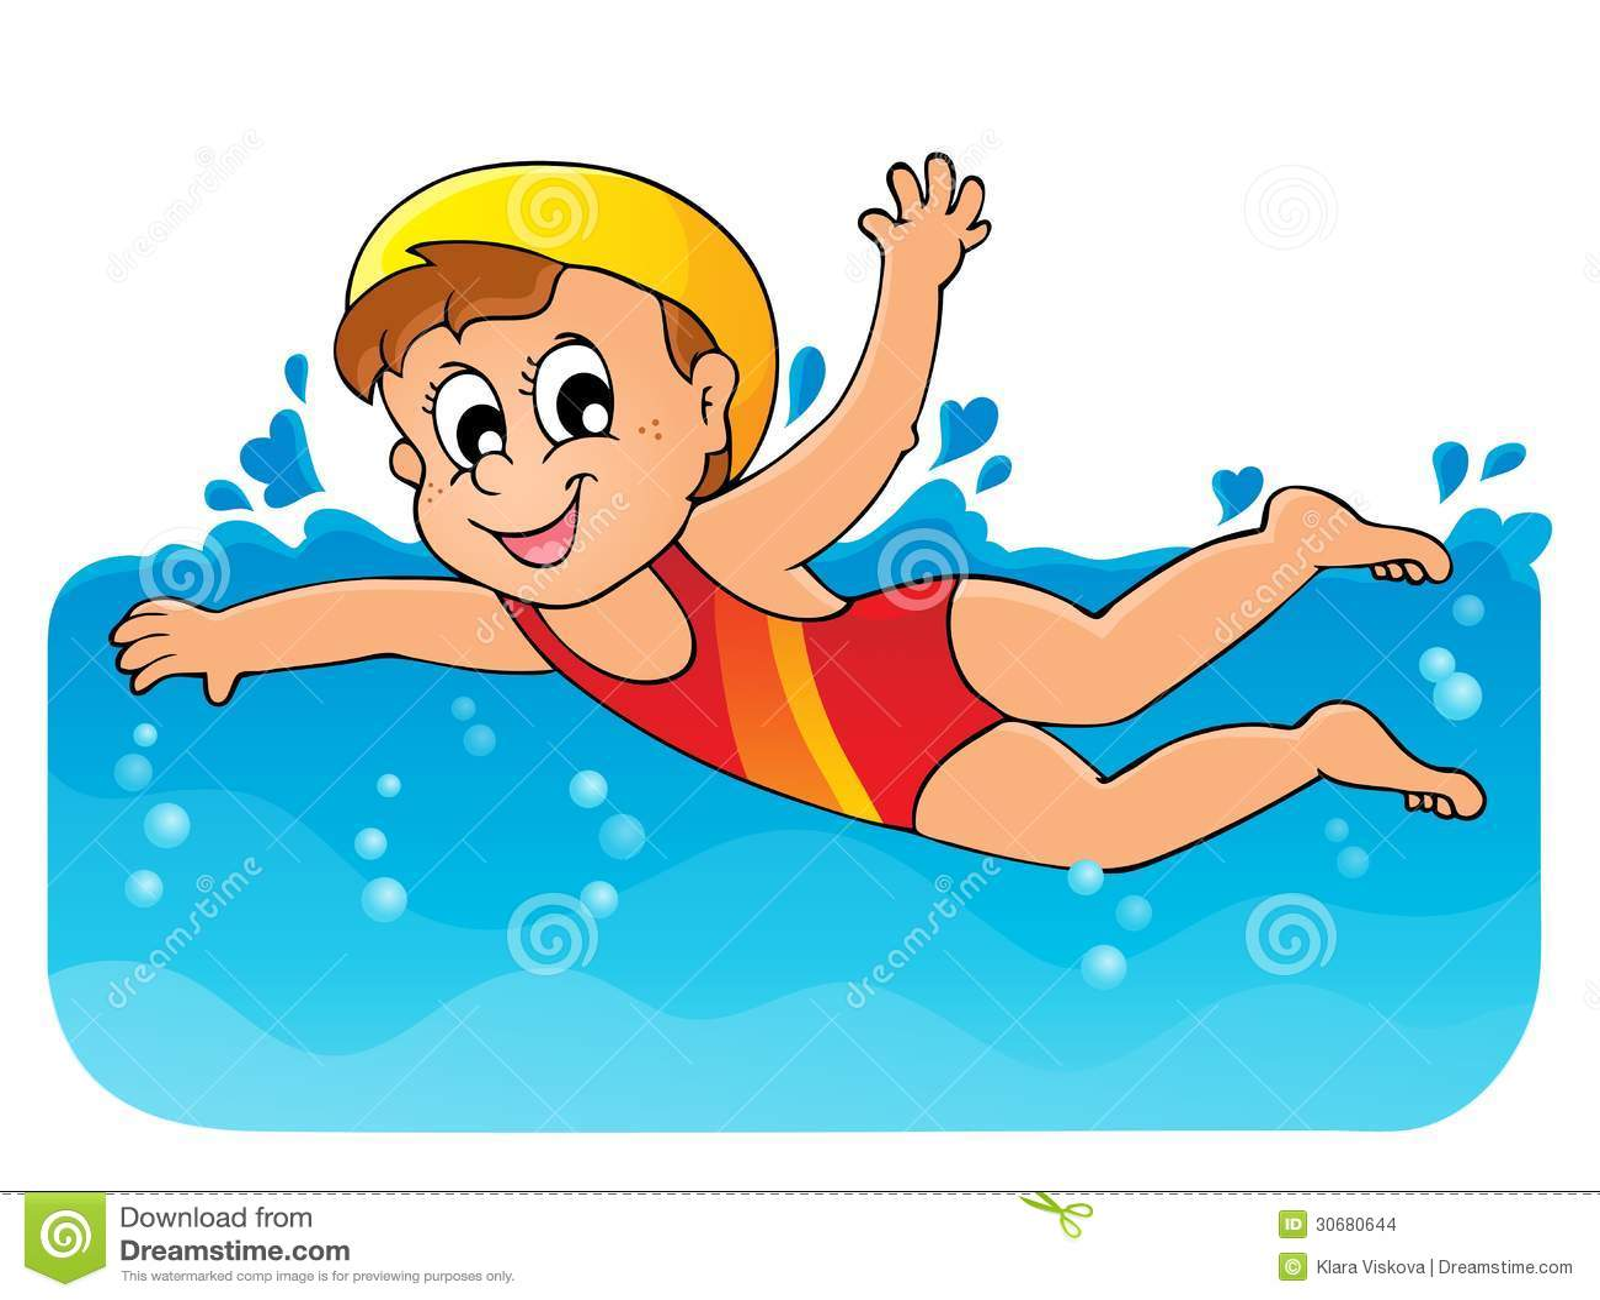 Swimming Theme Image 1 Stock Vector. Illustration Of Girl